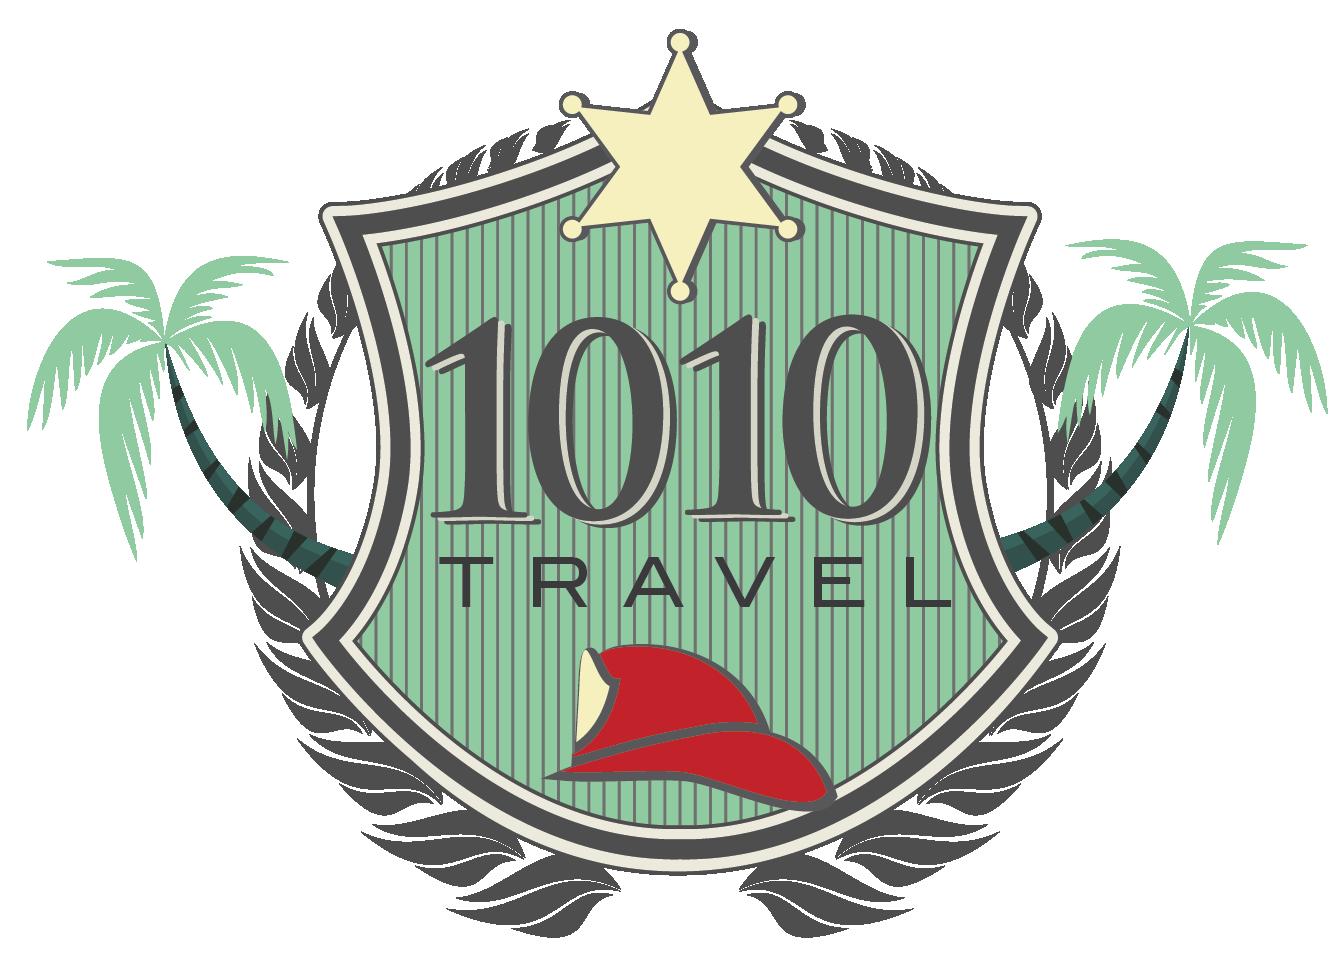 1010 Travel